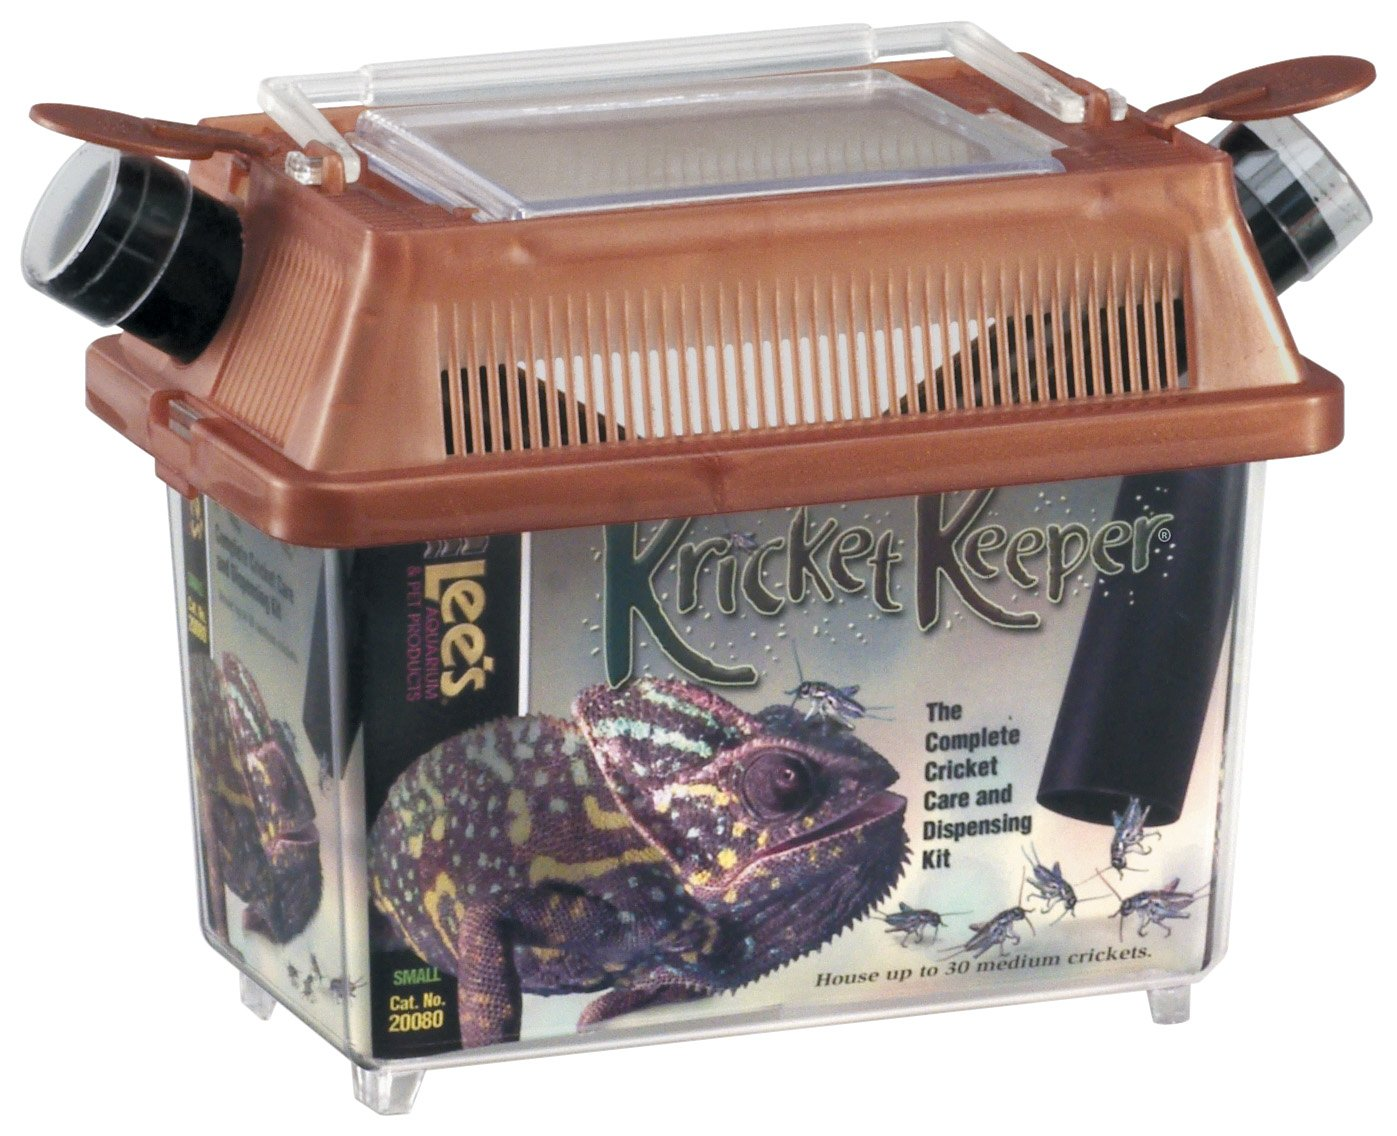 Lee's Kricket Keeper, Small